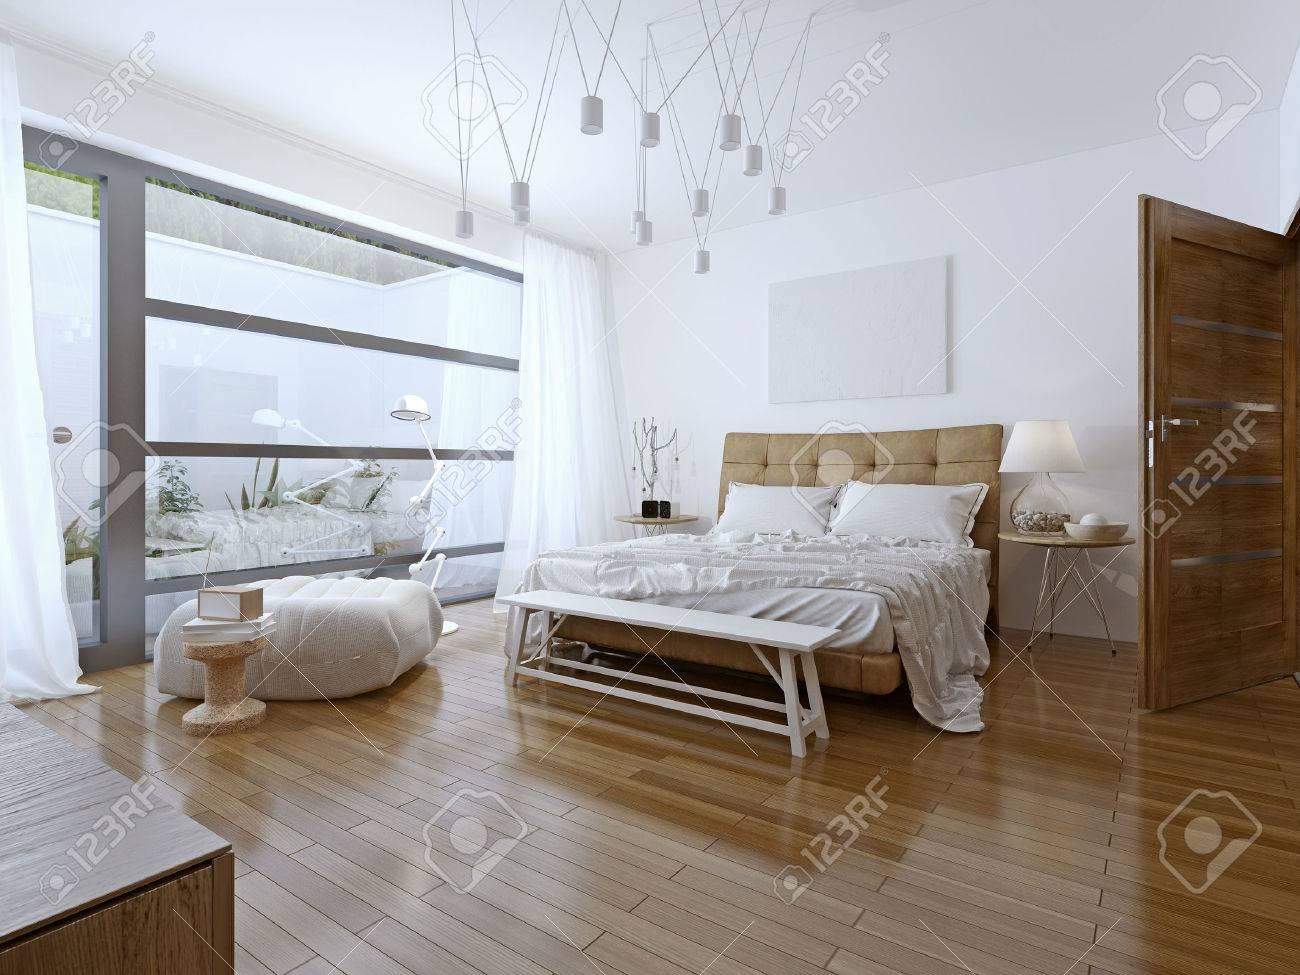 Chambre Lumineuse De Style Contemporain. Belle Grande Chambre Dans ...